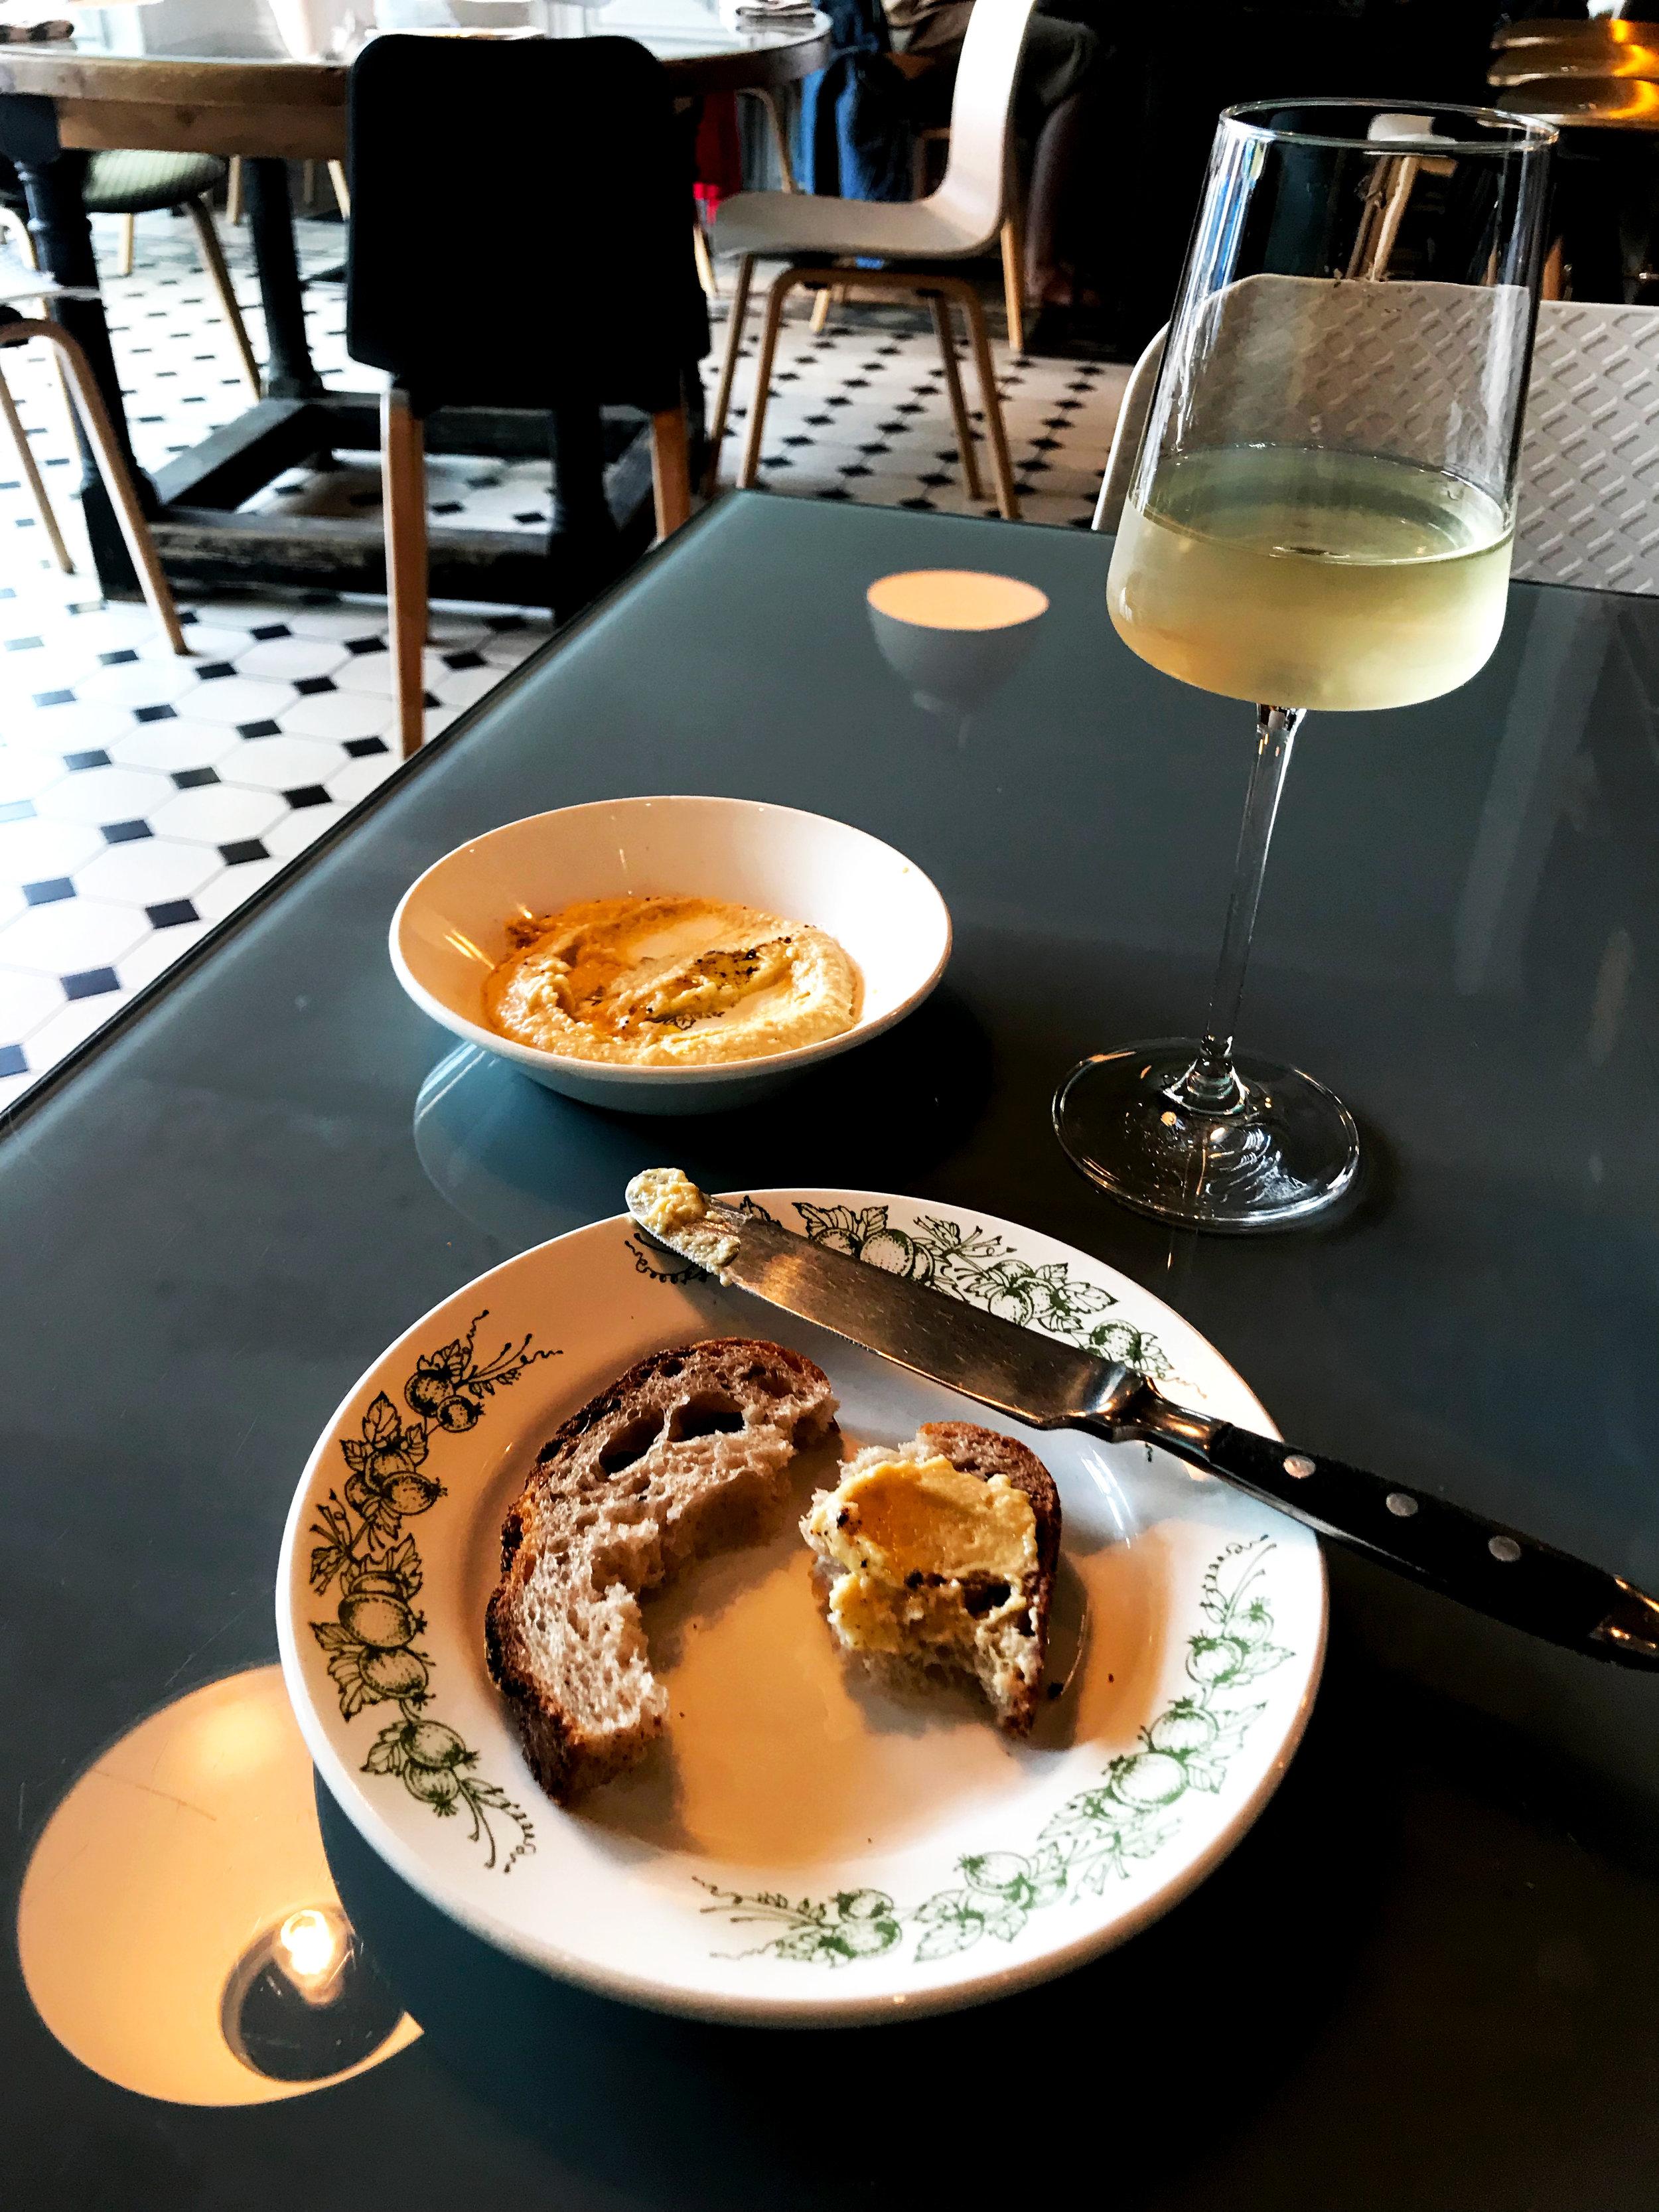 Хумус, хлеб и белое вино в ресторане Glenuill